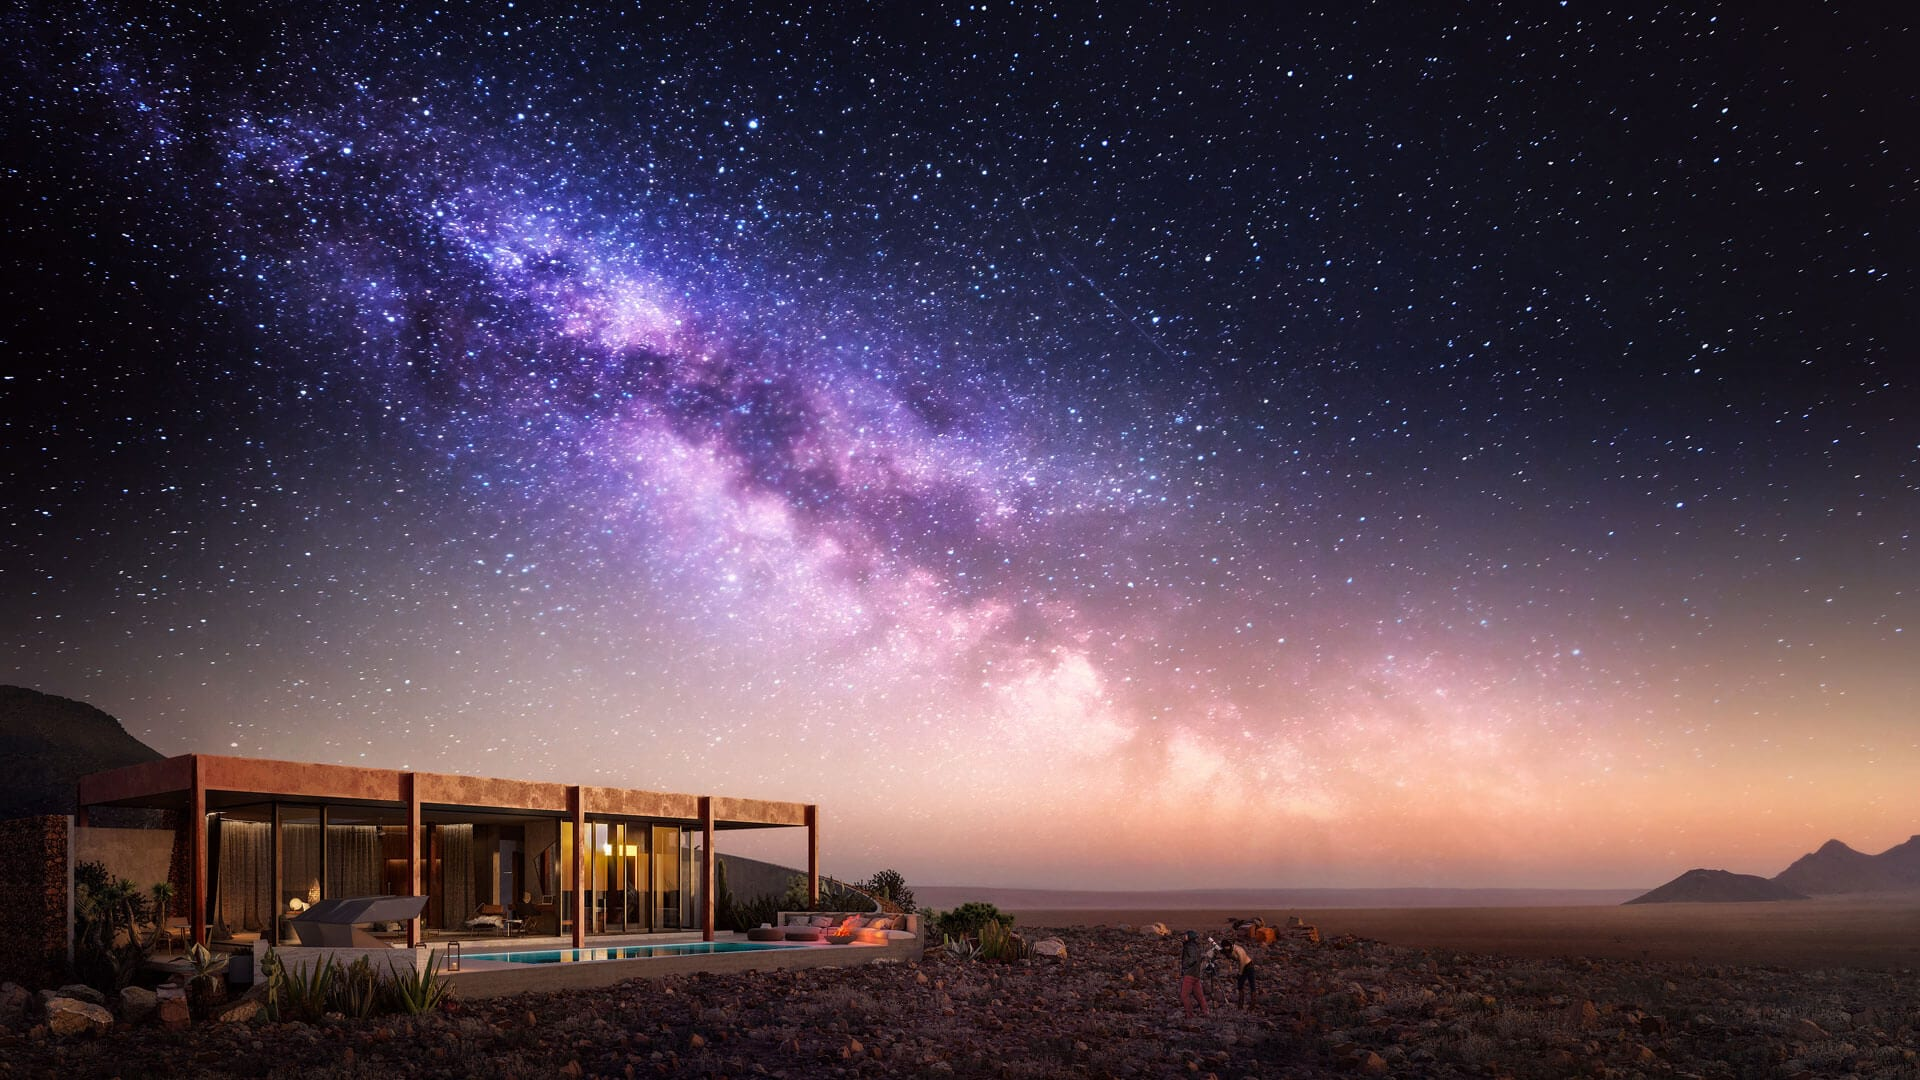 andBeyond Sossusvlei Desert - Namibia - onde ficar